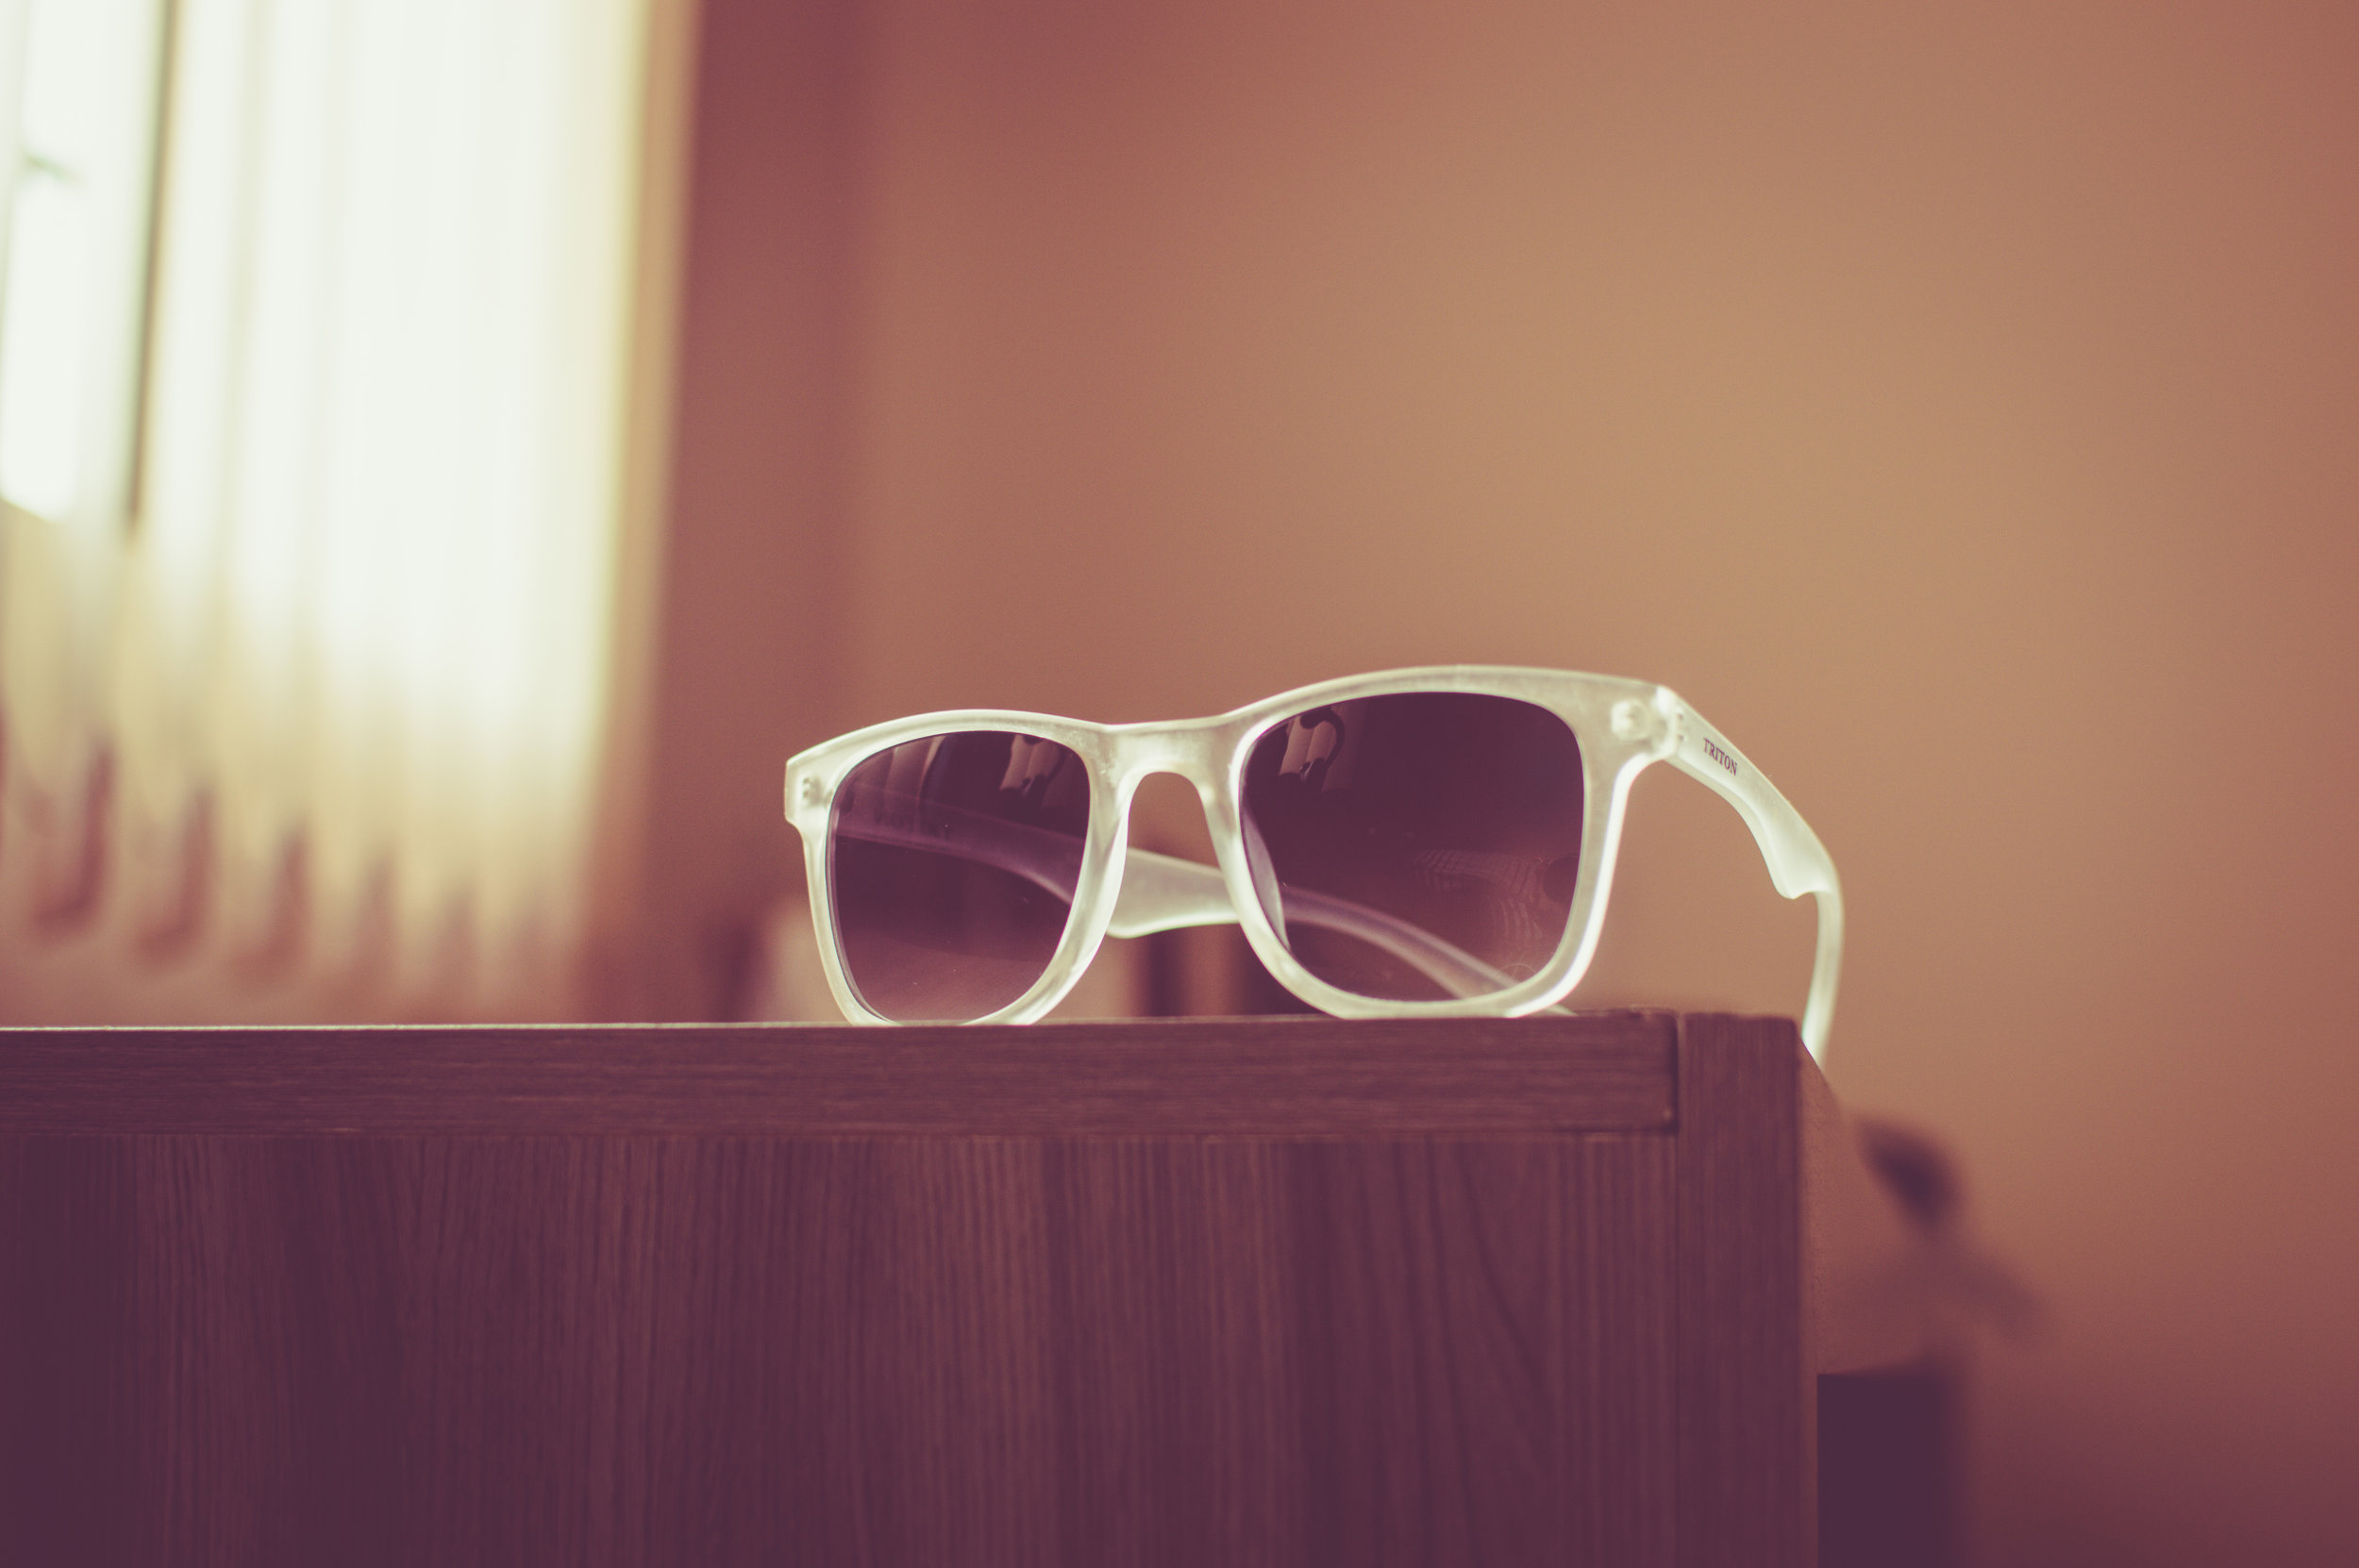 heatwave sunglasses.jpg